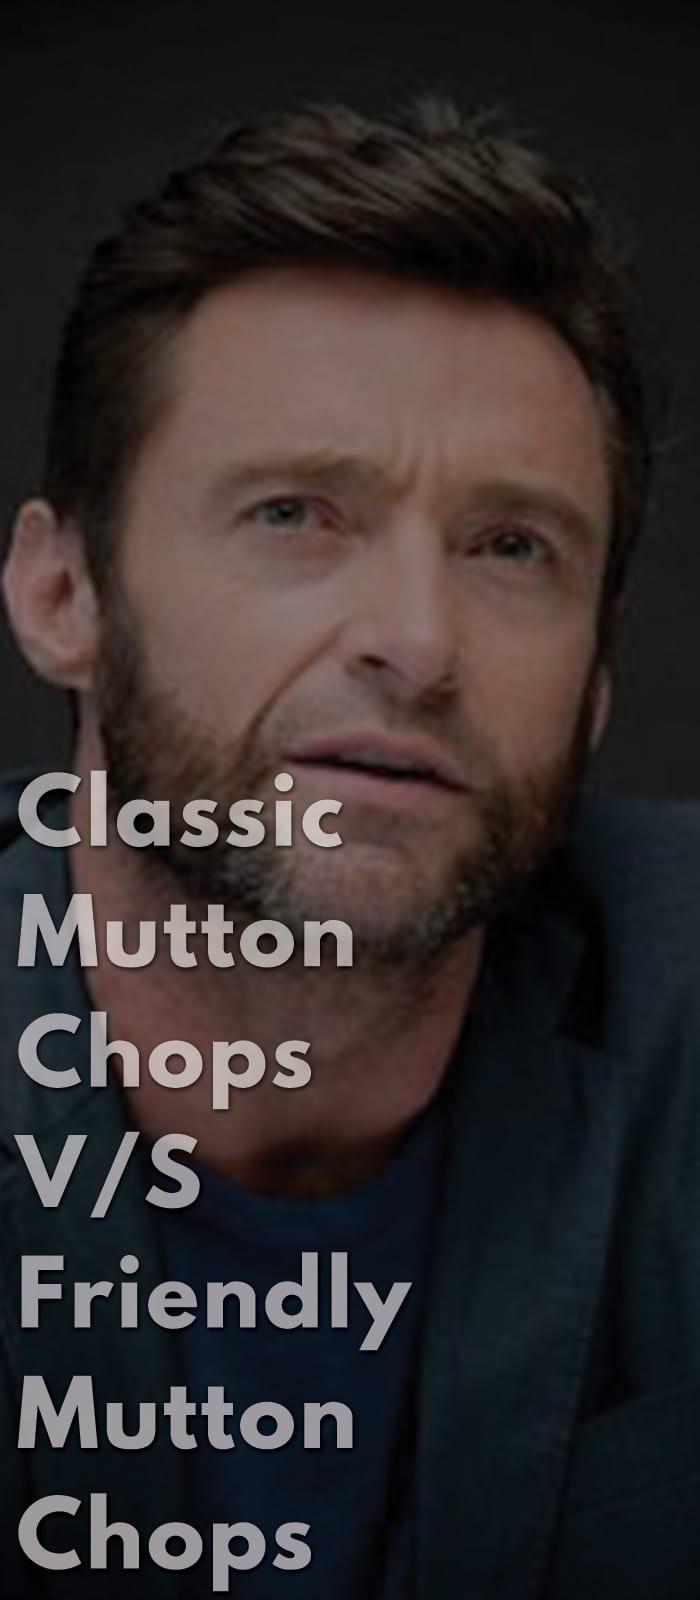 Classic-Mutton-Chops-&-Friendly-Mutton-Chops.